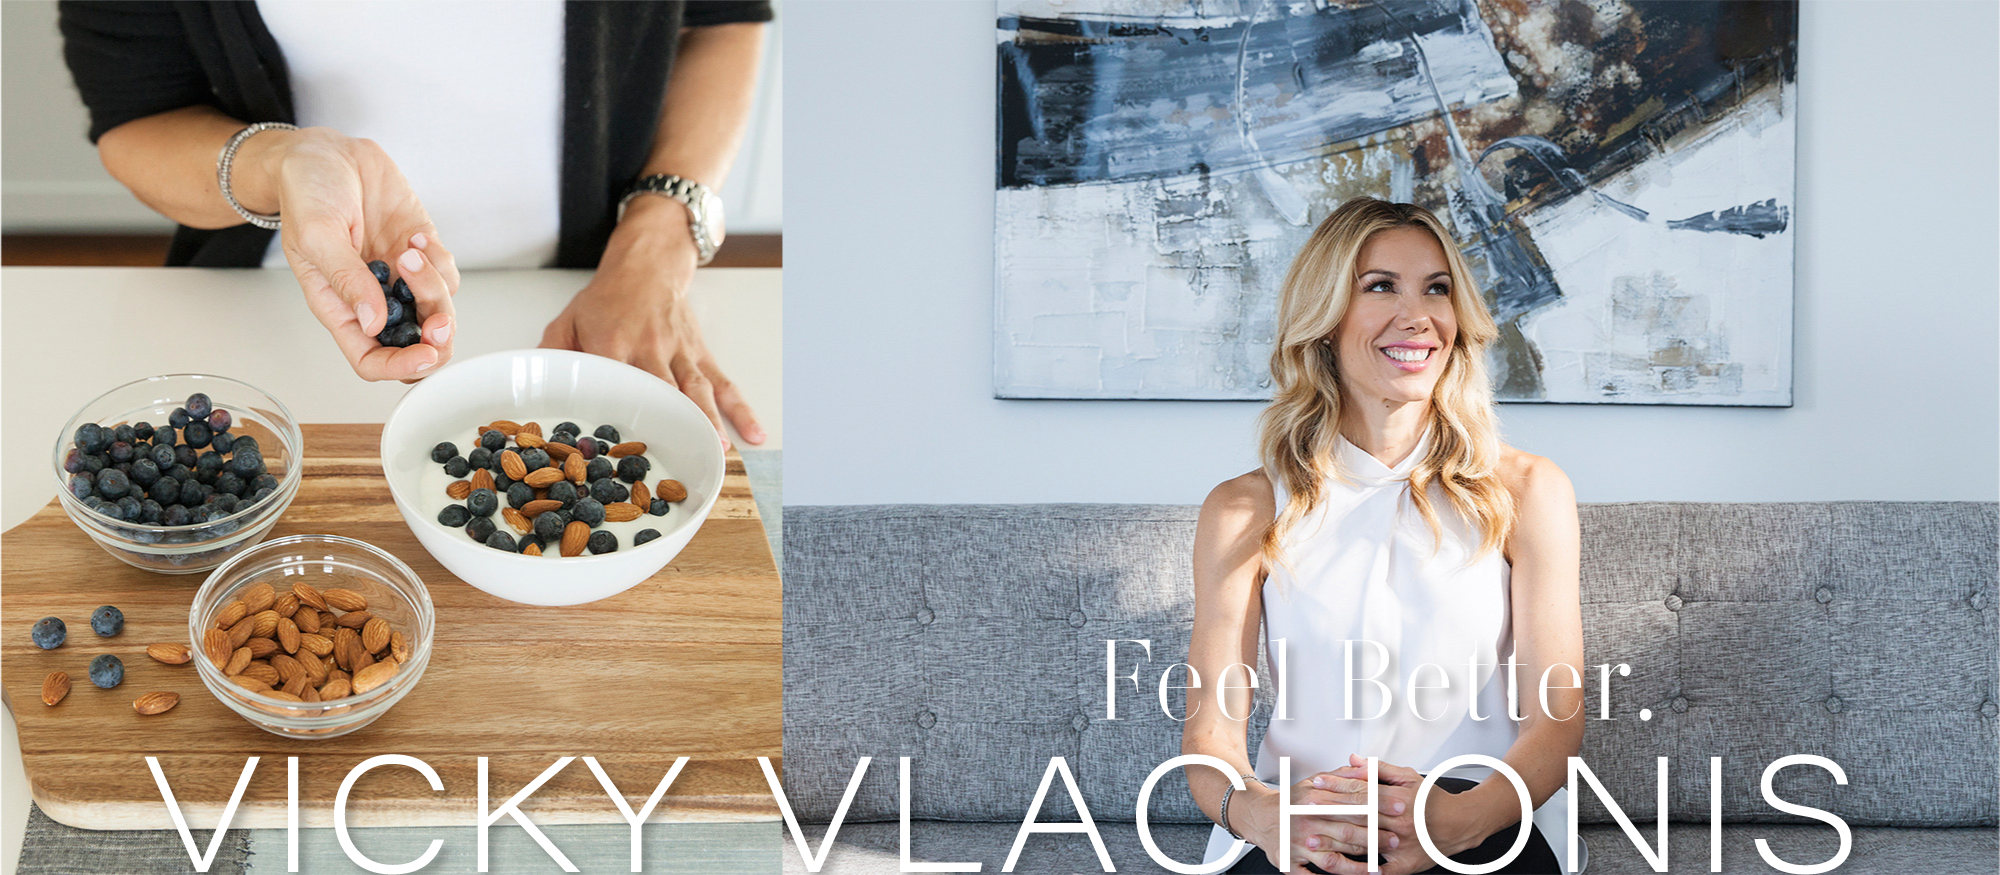 Vicky Vlachonis